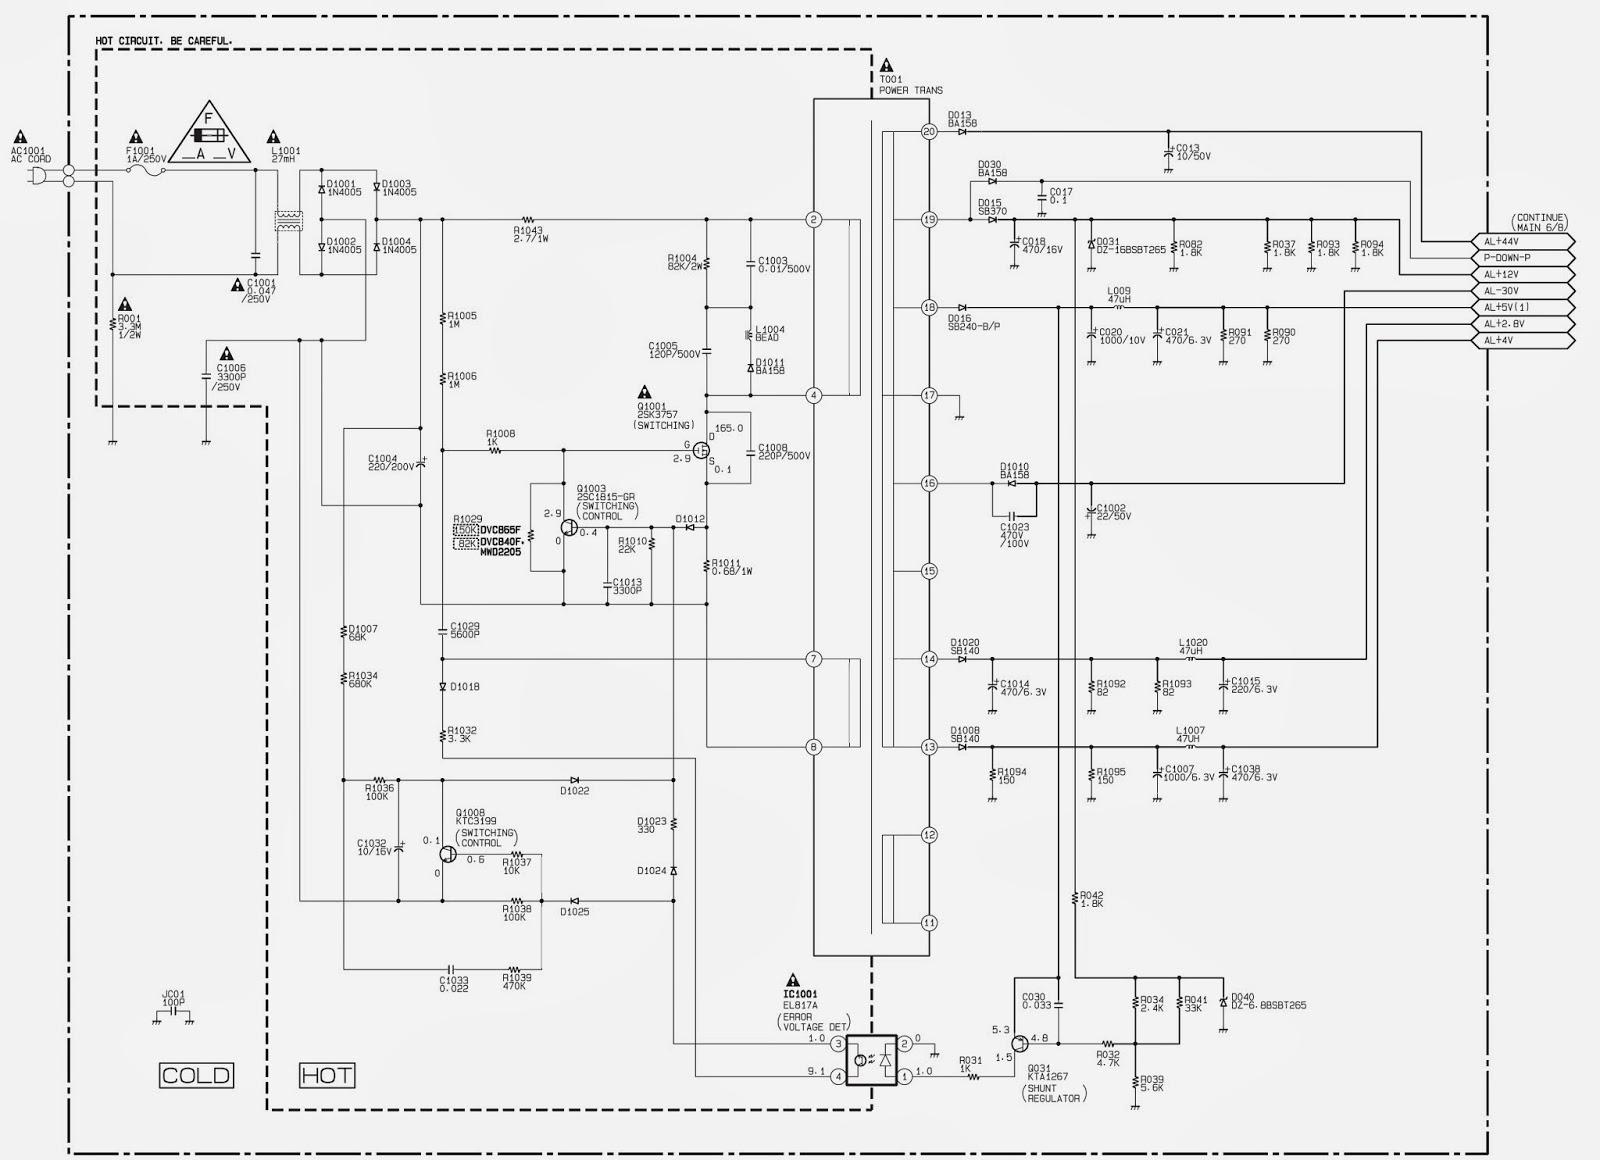 dvds2700 power supply smps schematic circuit diagram dvd data dvds2700 power supply smps schematic circuit diagram dvd [ 1600 x 1160 Pixel ]